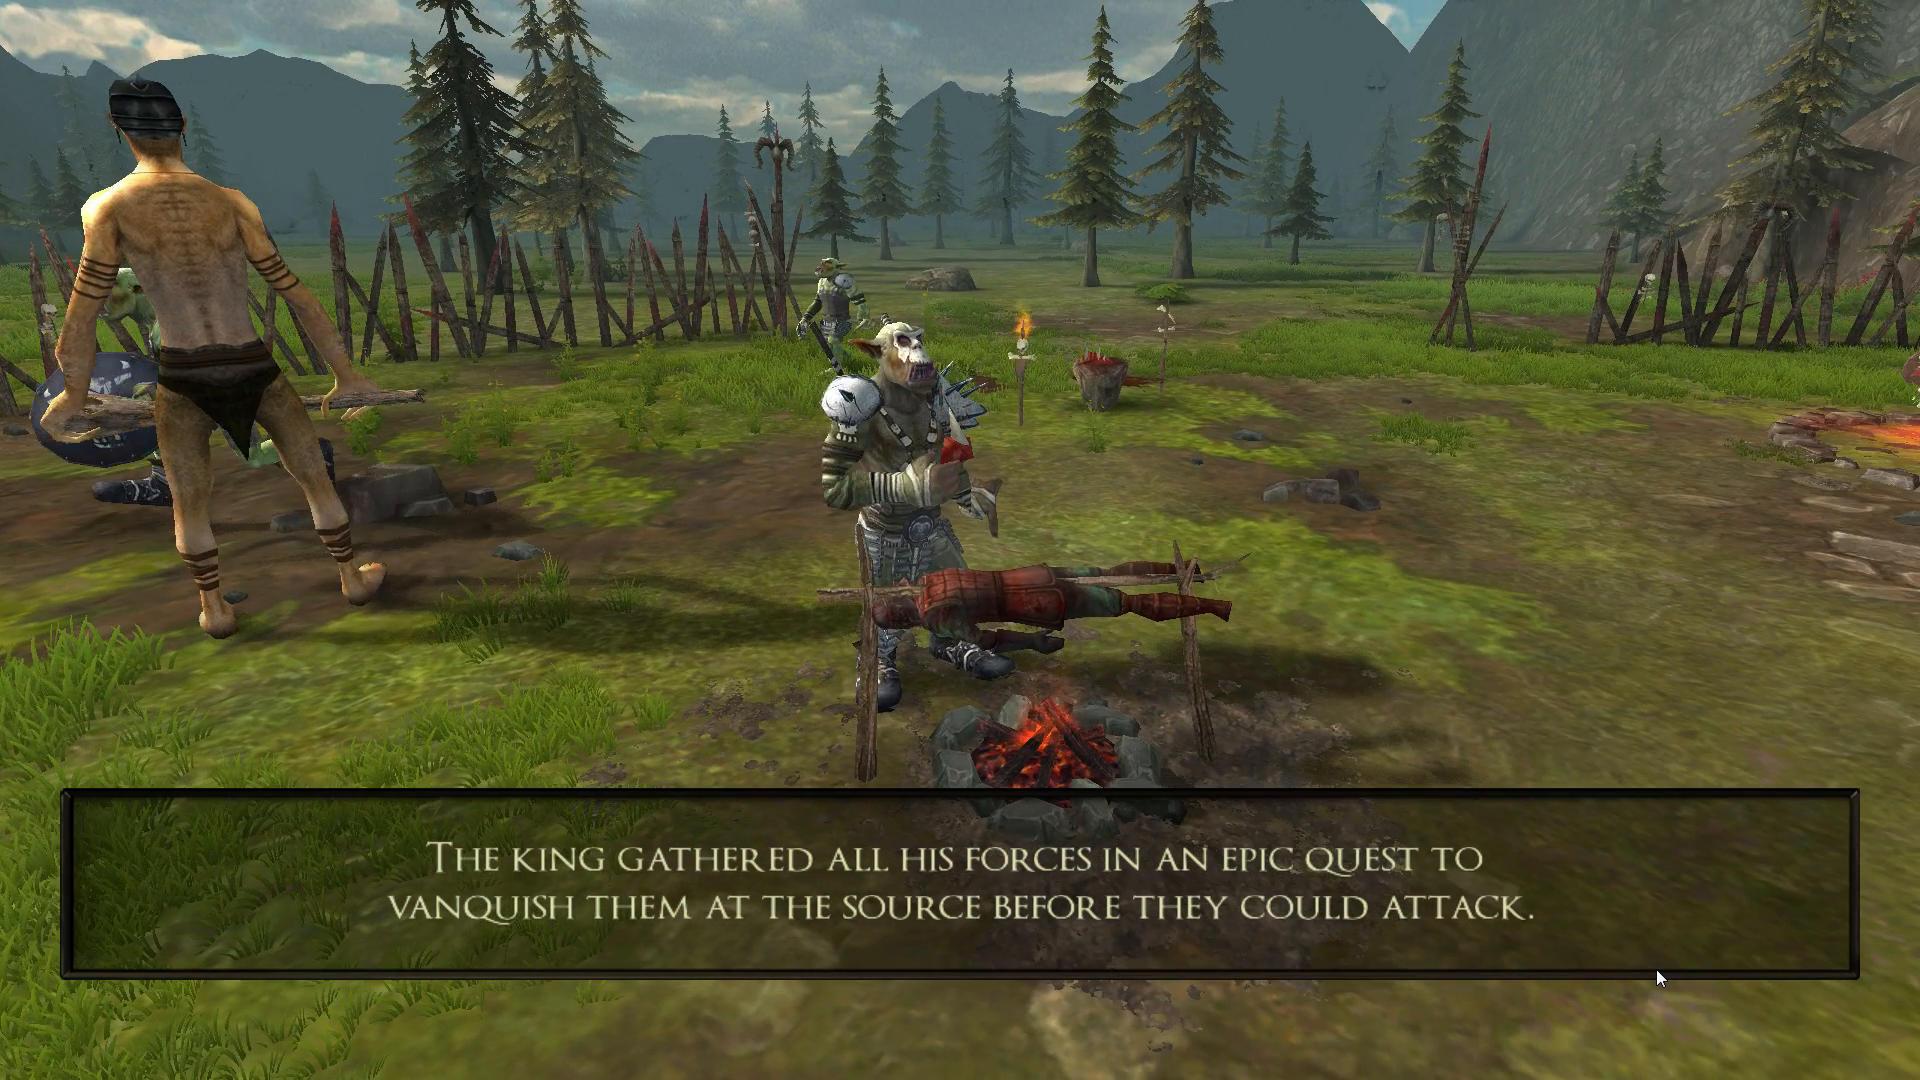 http://media.indiedb.com/images/games/1/27/26479/heldric-story-shot.jpg